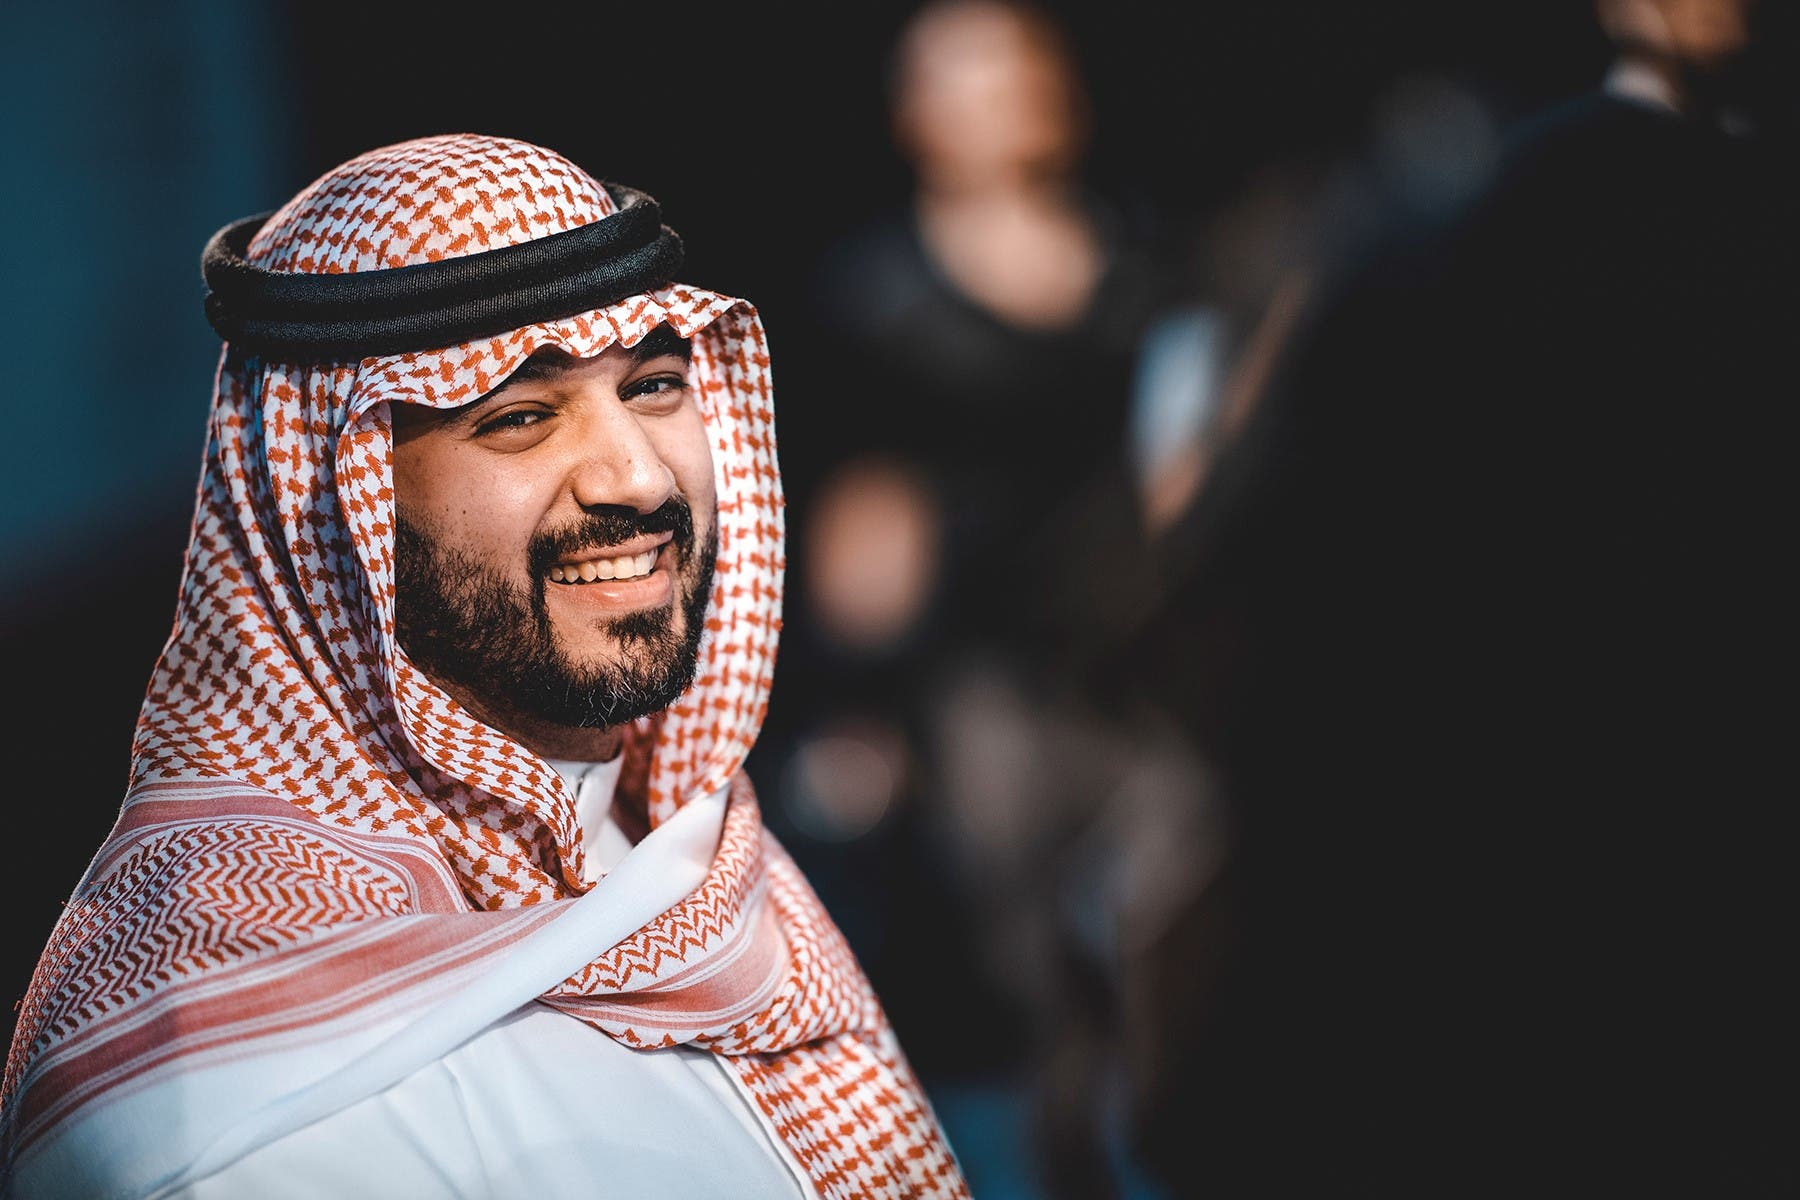 HRH Prince Faisal bin Bandar bin Sultan, SEF President. (Supplied)